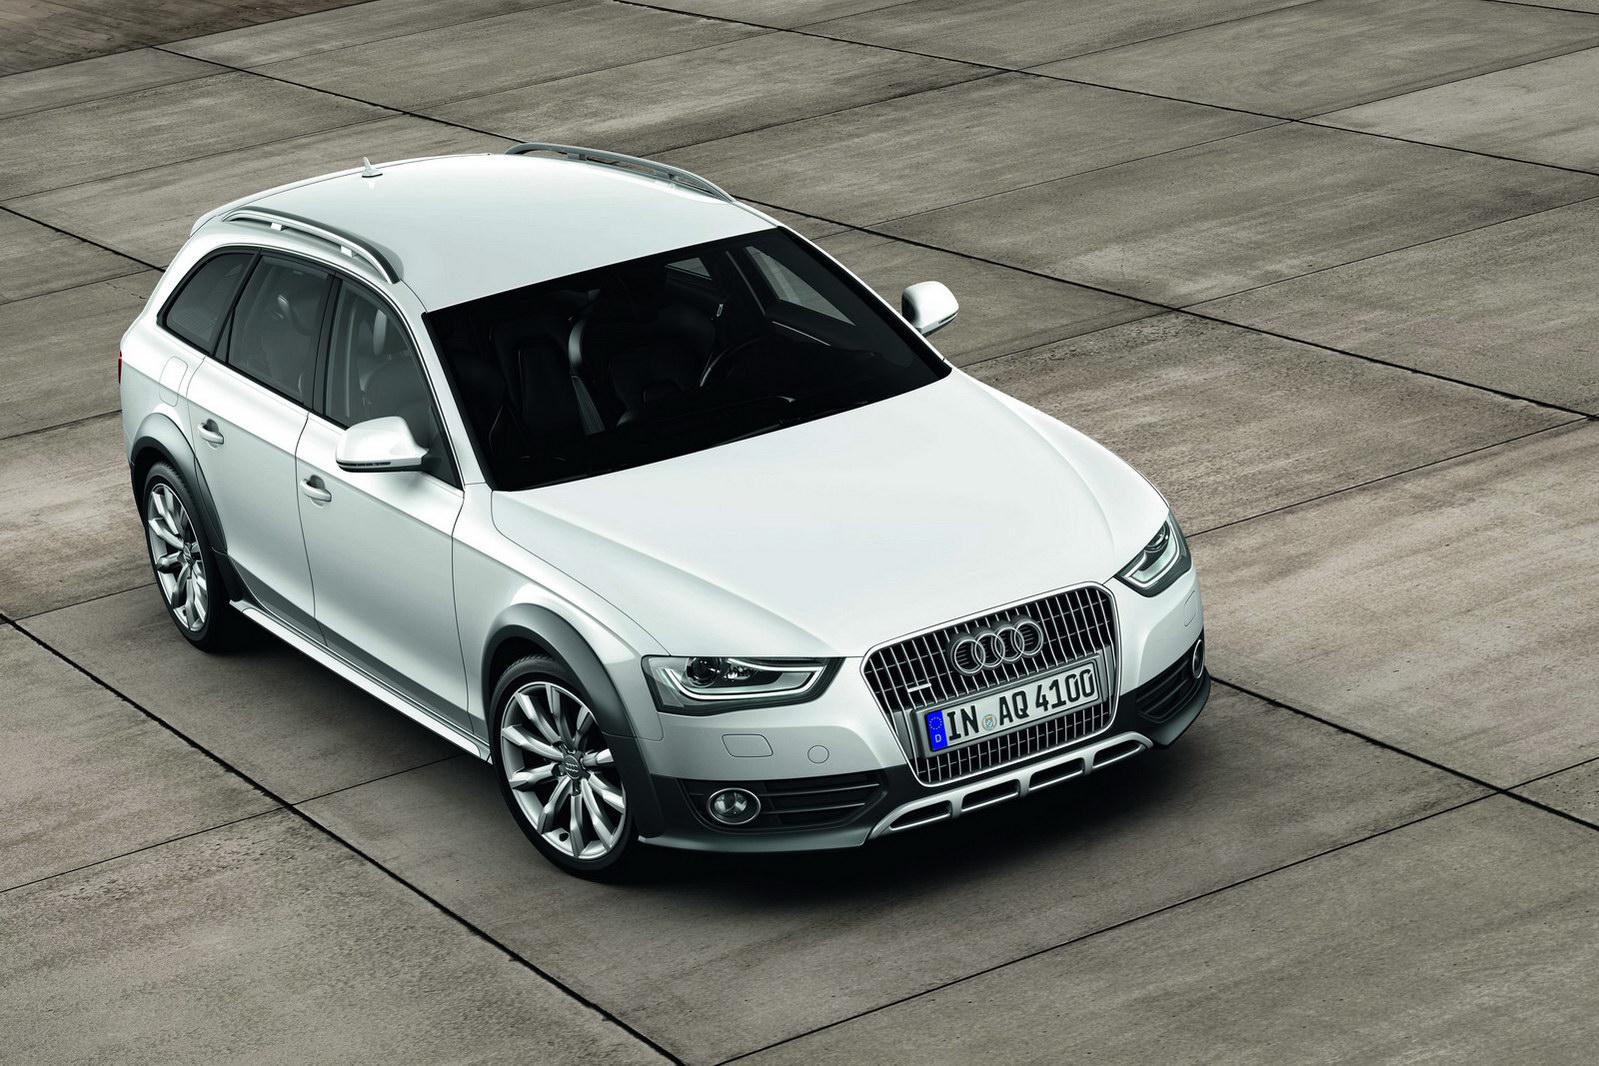 2013 Audi A4 Facelift Revealed - autoevolution